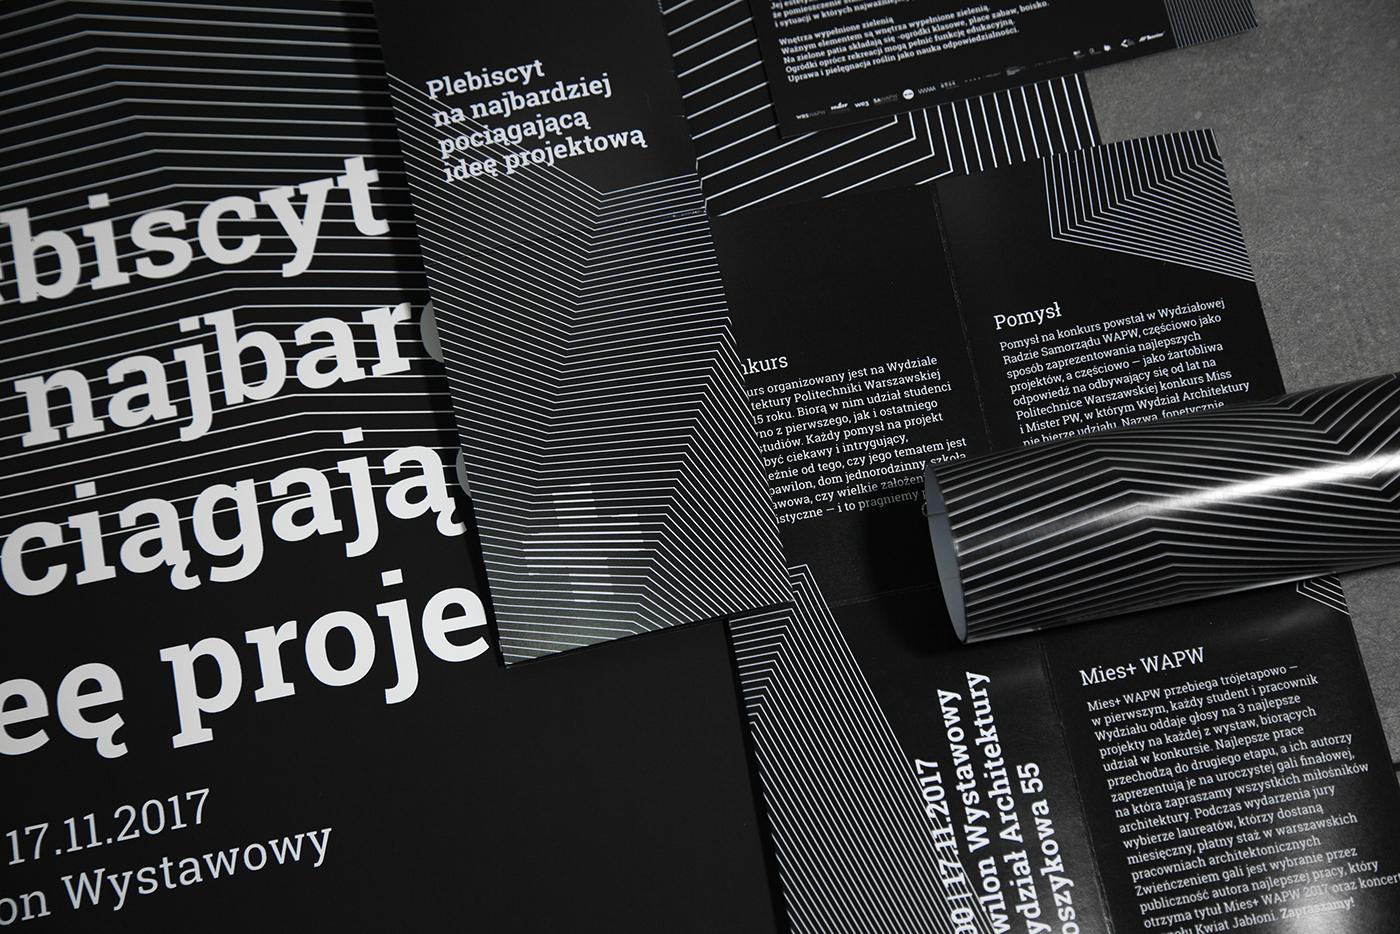 visual identity Event Gala poster mies+ wapw